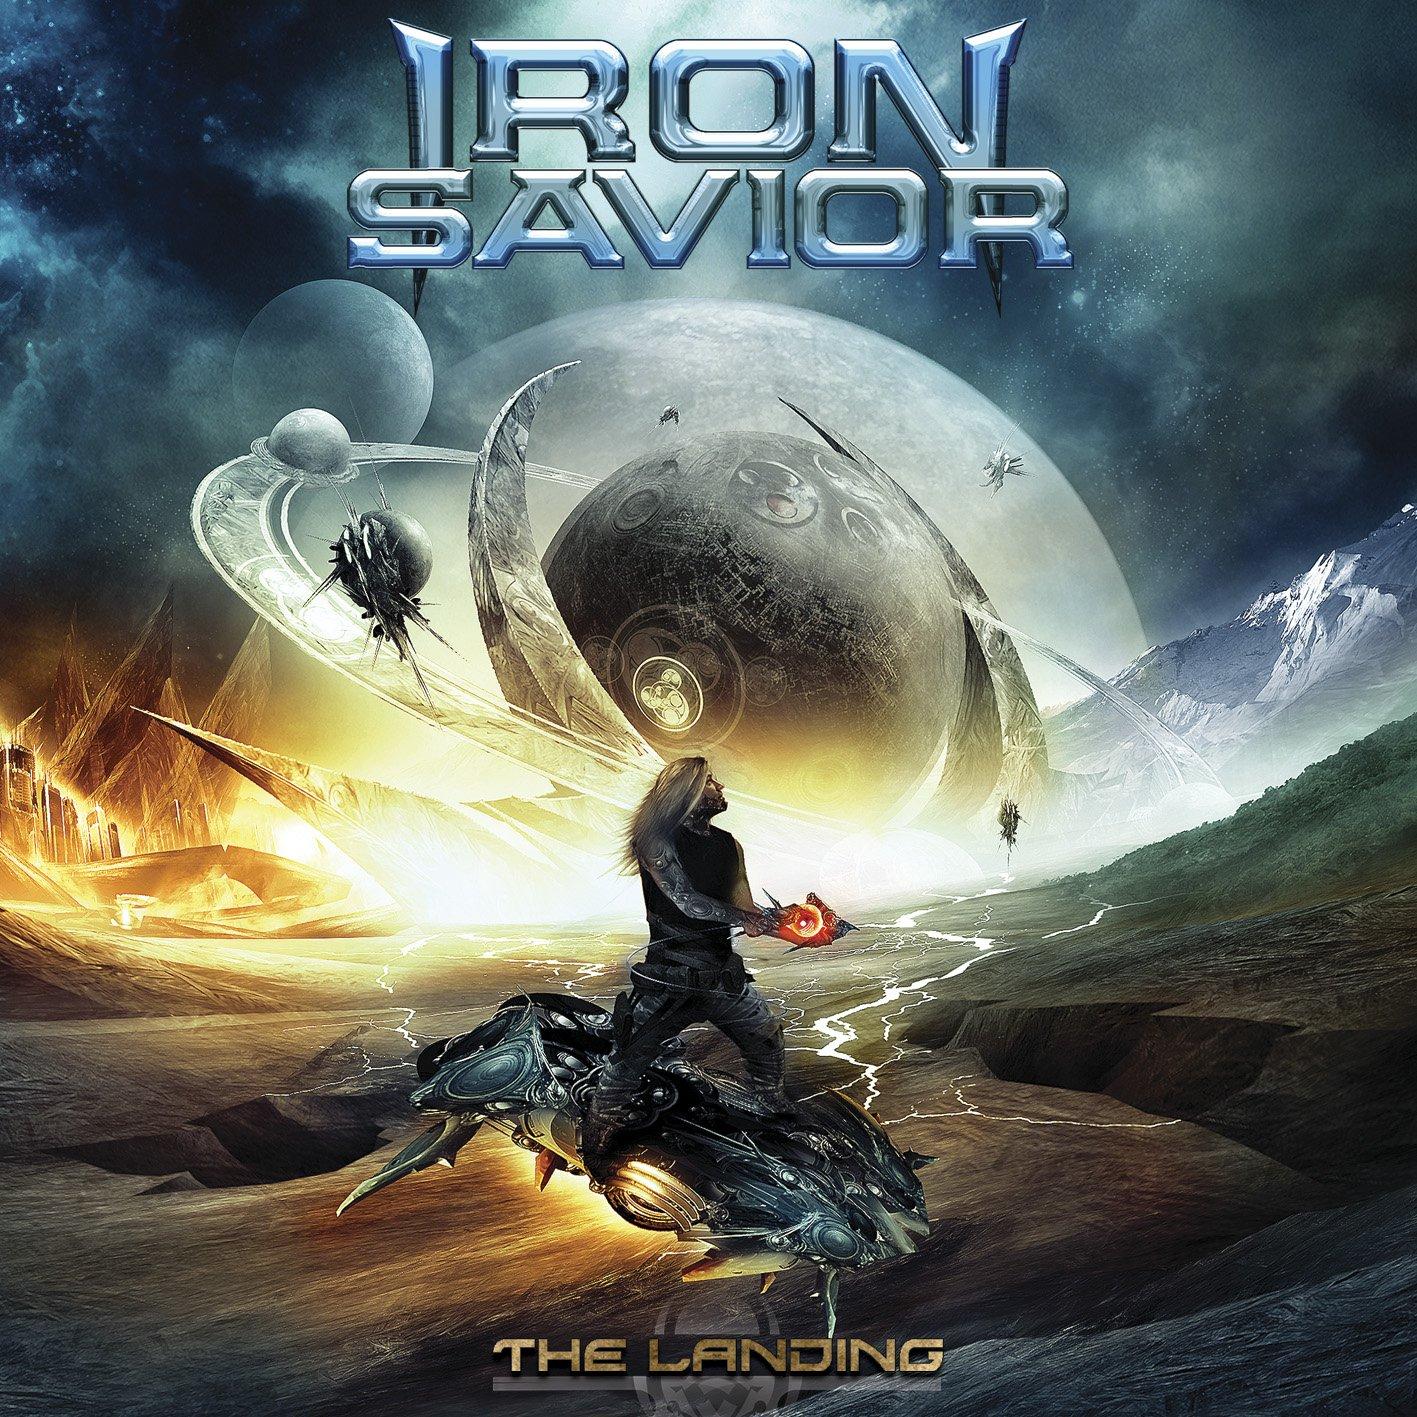 Iron Savior – The Landing (2017) [FLAC]